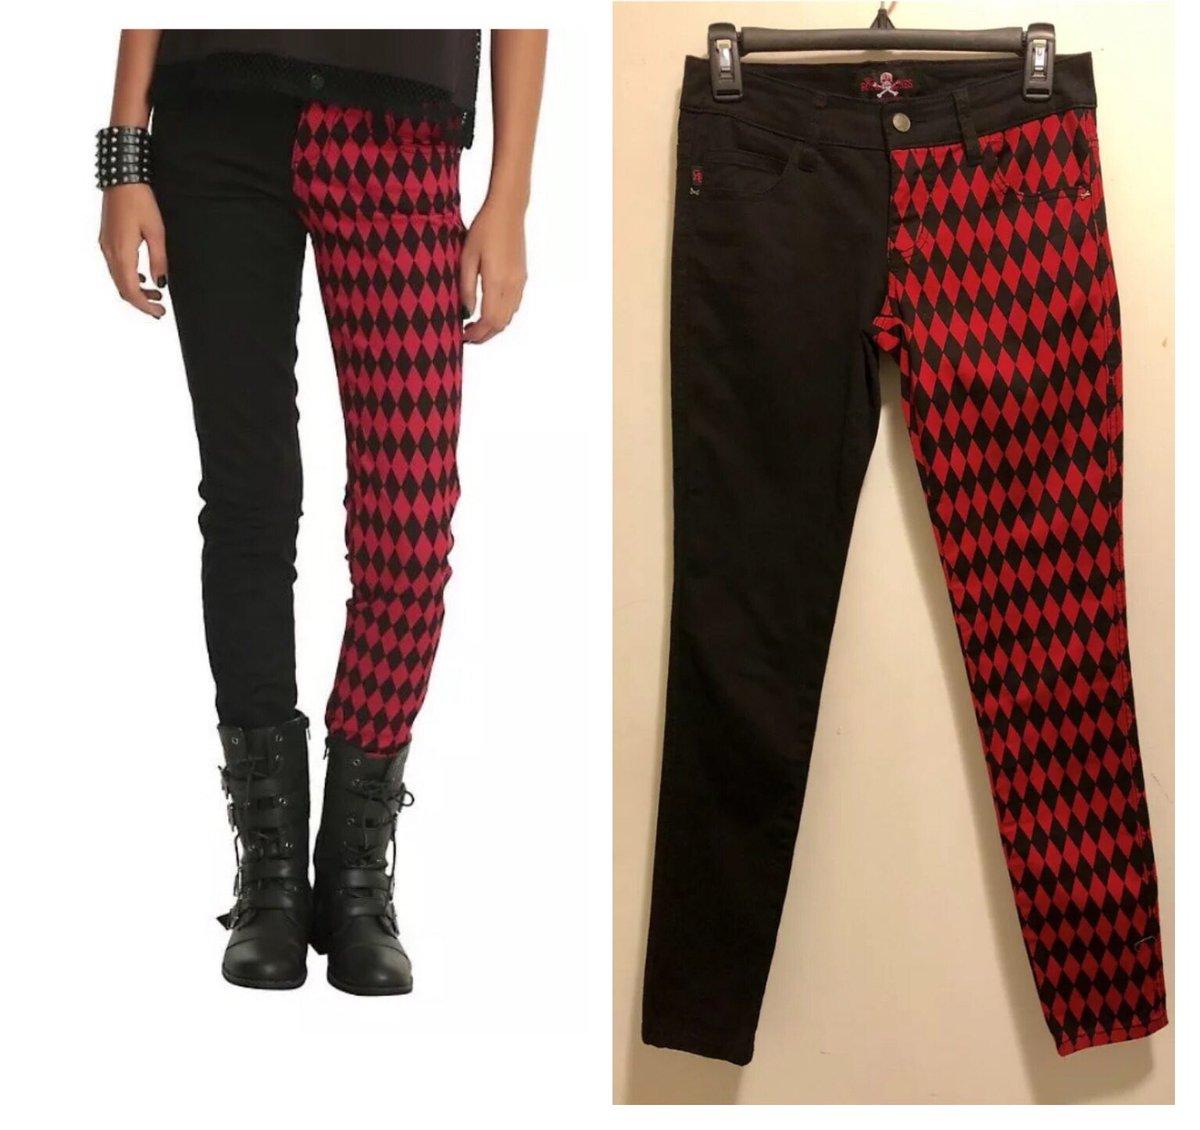 ee3740a9aba7 New Royal Bones Red & Black Split Leg Diamond Pattern Skinny Jeans Adult  Size 1.pic.twitter.com/mW1nw3joJJ